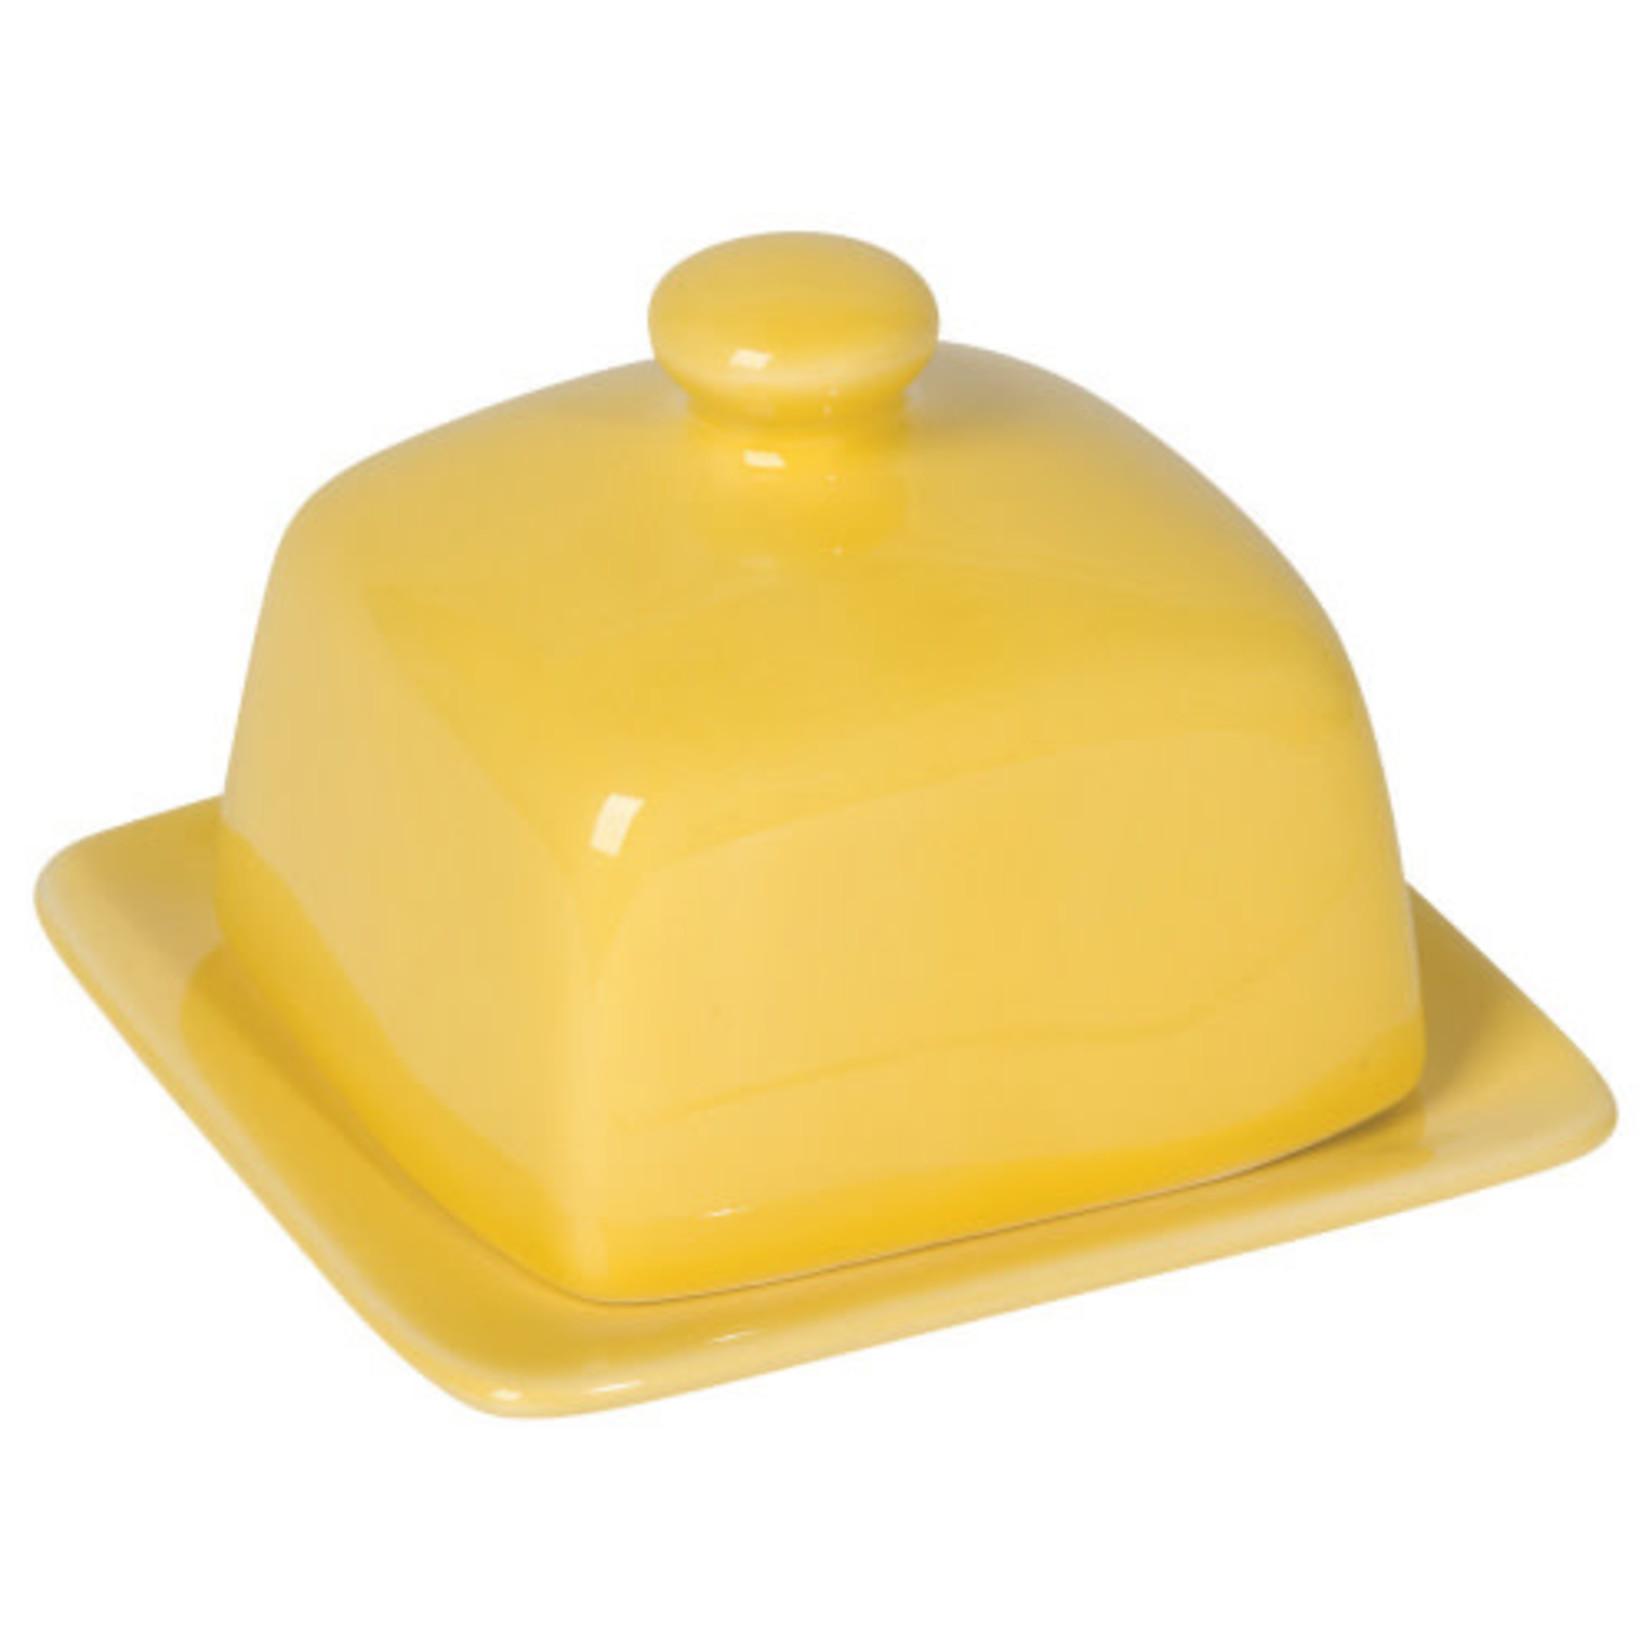 Danica Butter Dish square Lemon